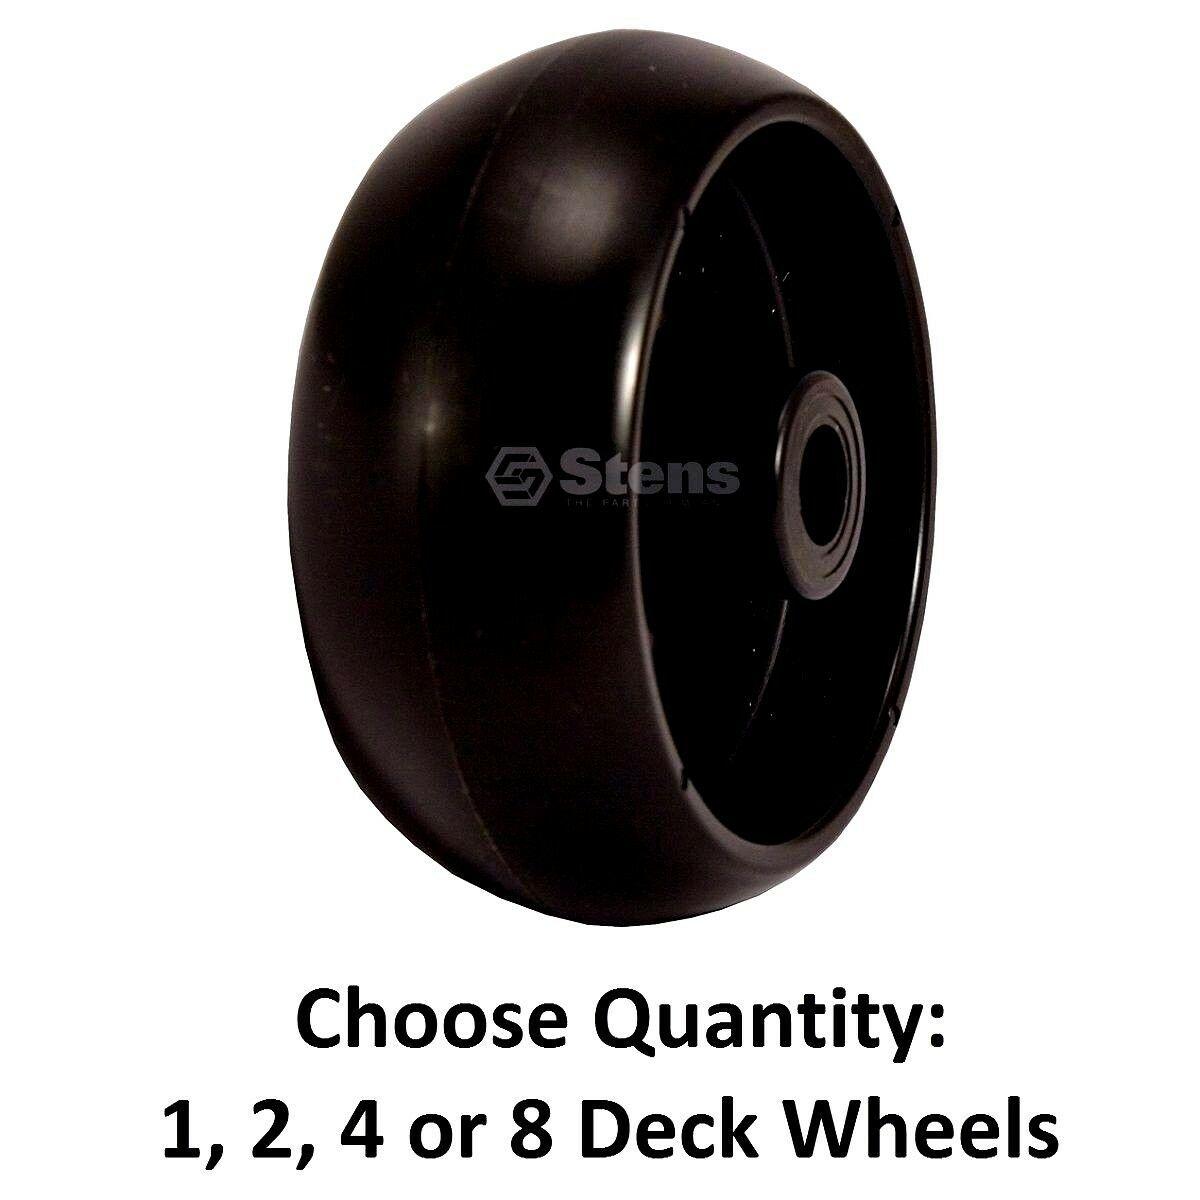 Mower Deck Gage Wheel For JD L100 L105 L107 L108 L110 L111 L118 L130 102 105 - $7.53 - $41.05